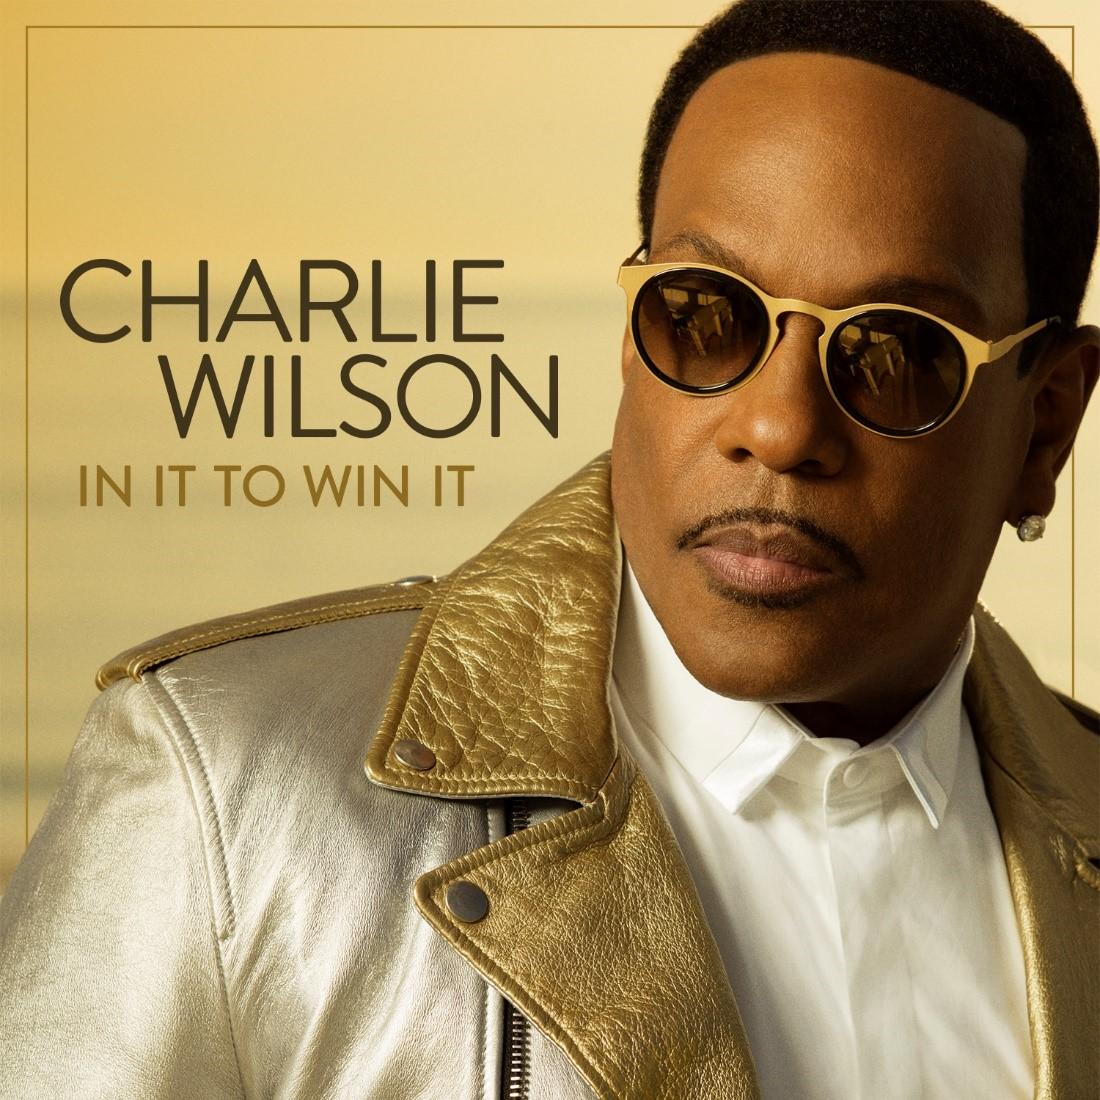 0000-Charlie_Wilson_-_In_it_to_win_it